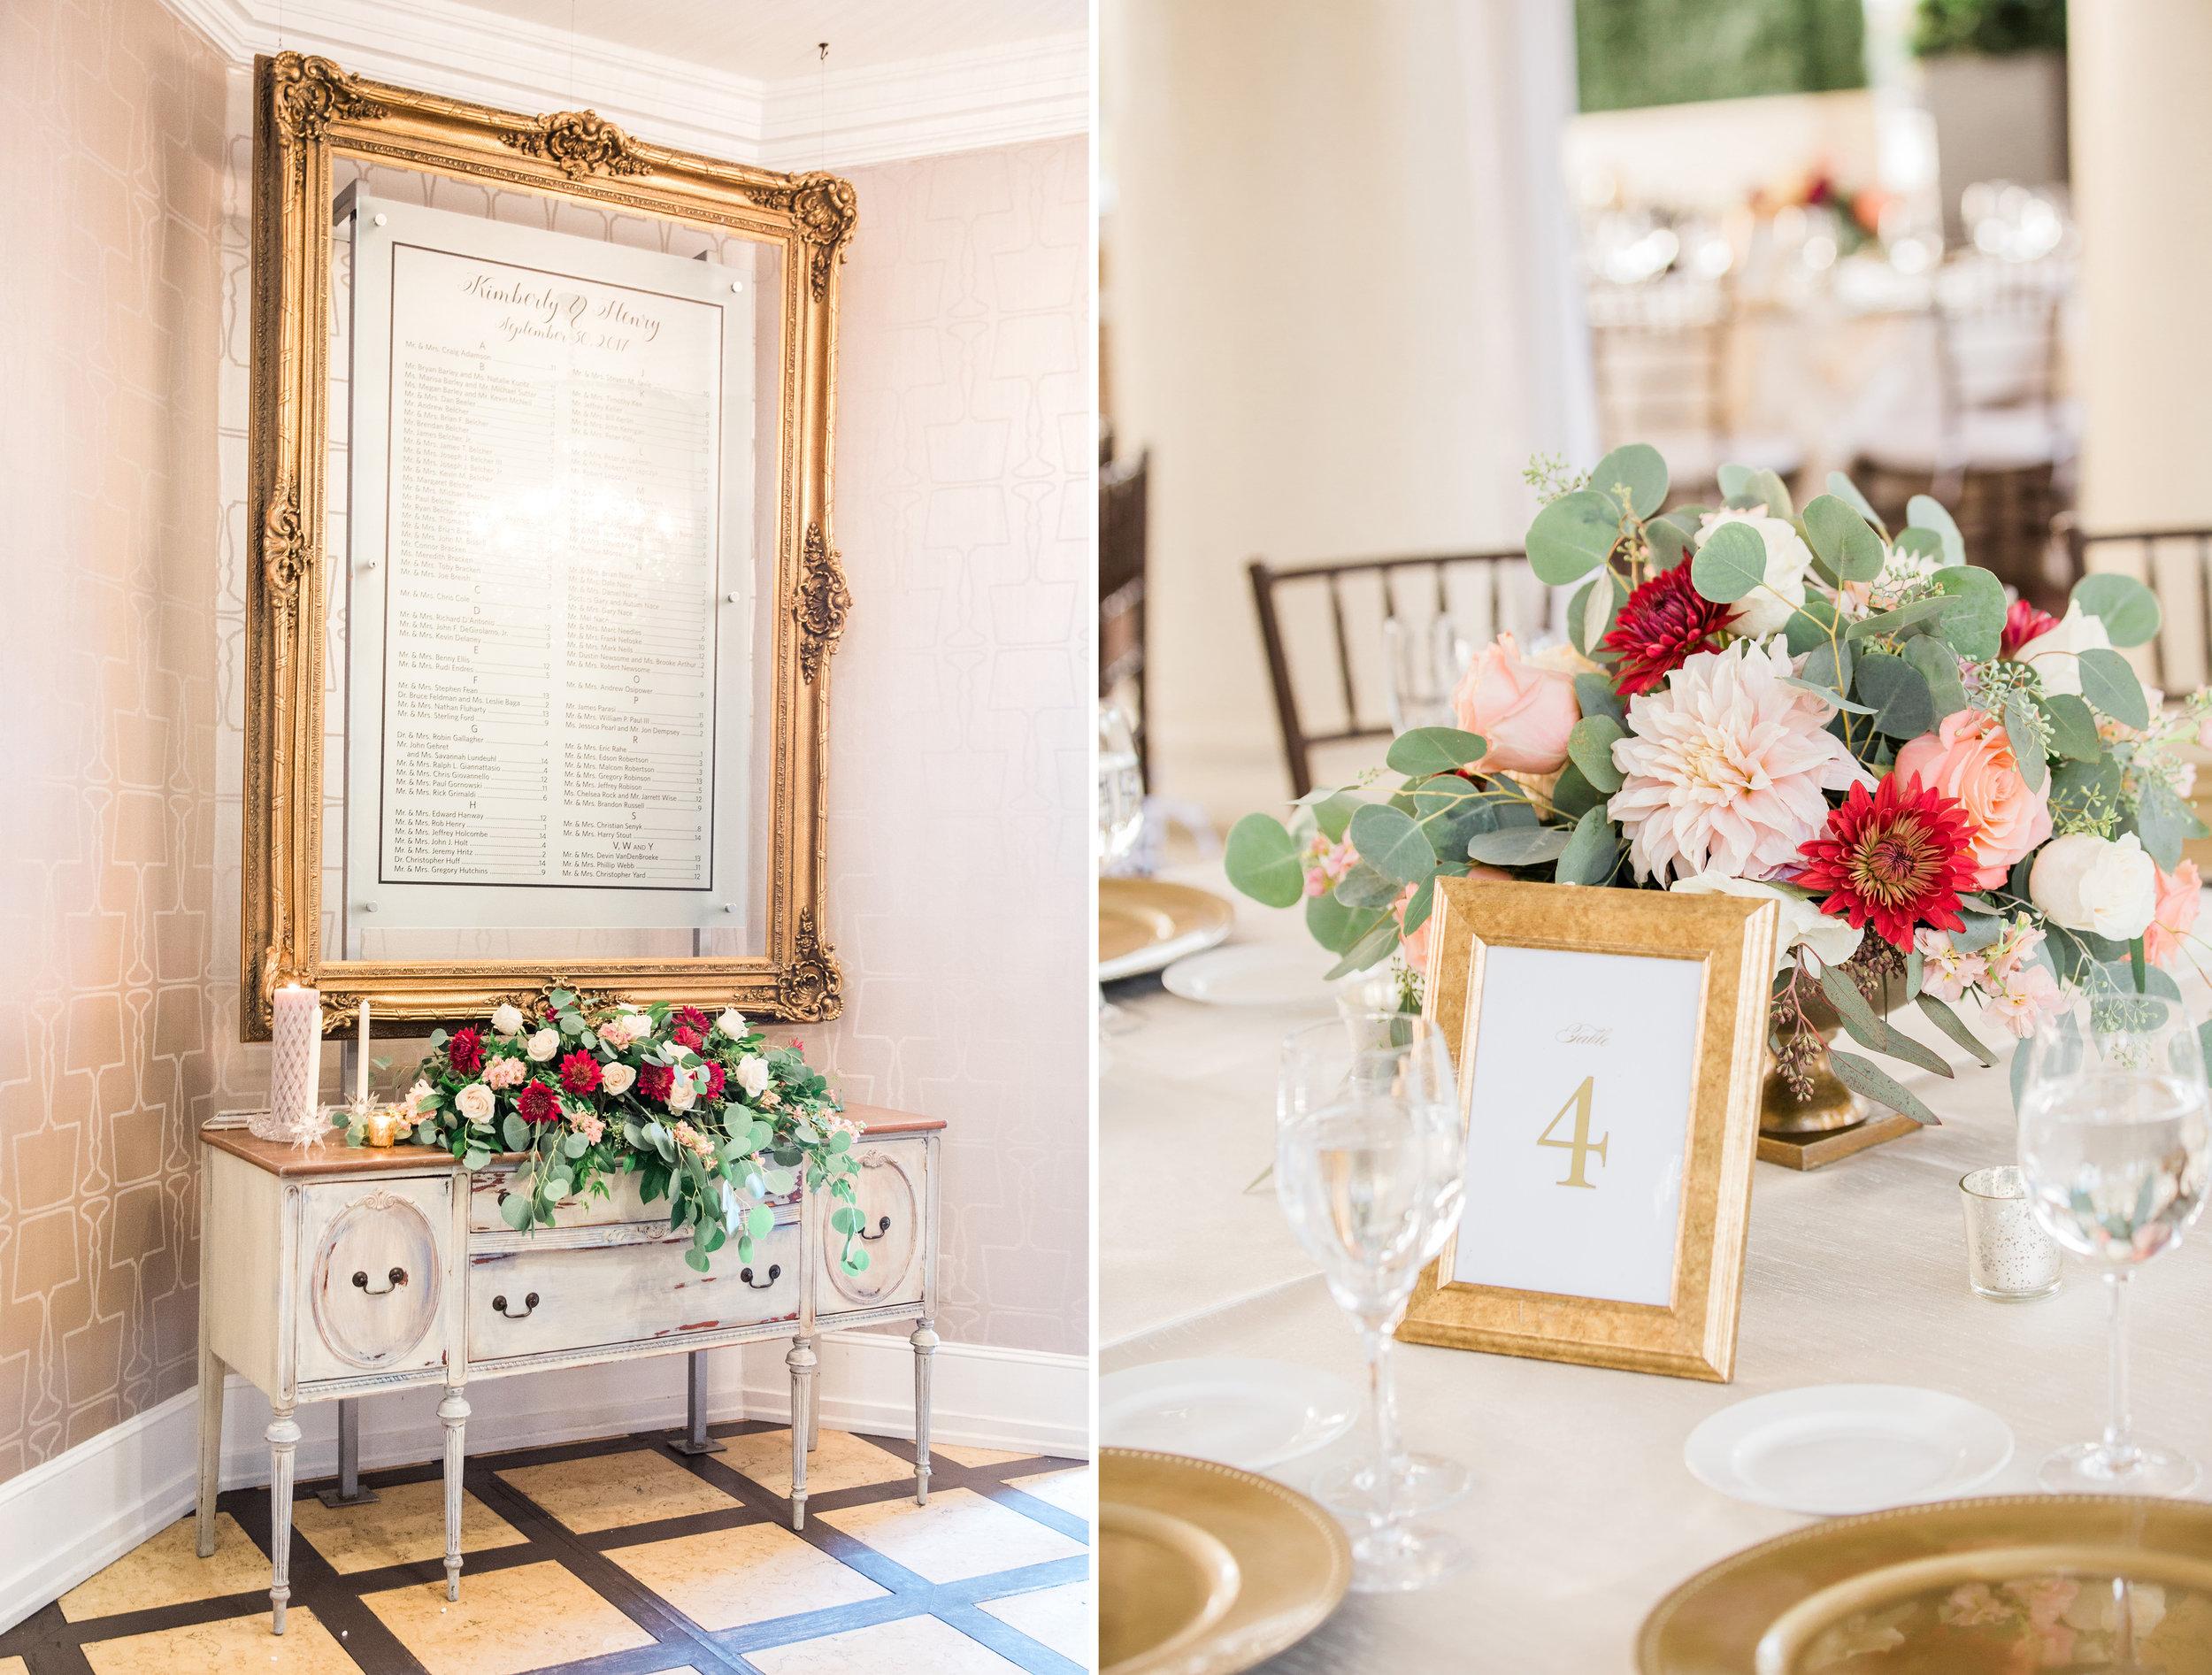 Hudson-Nichols-Black-Tie-Bride-Philadelphia-Waterworks-Wedding-Cescaphe-Reception-Floral-Details18.jpg